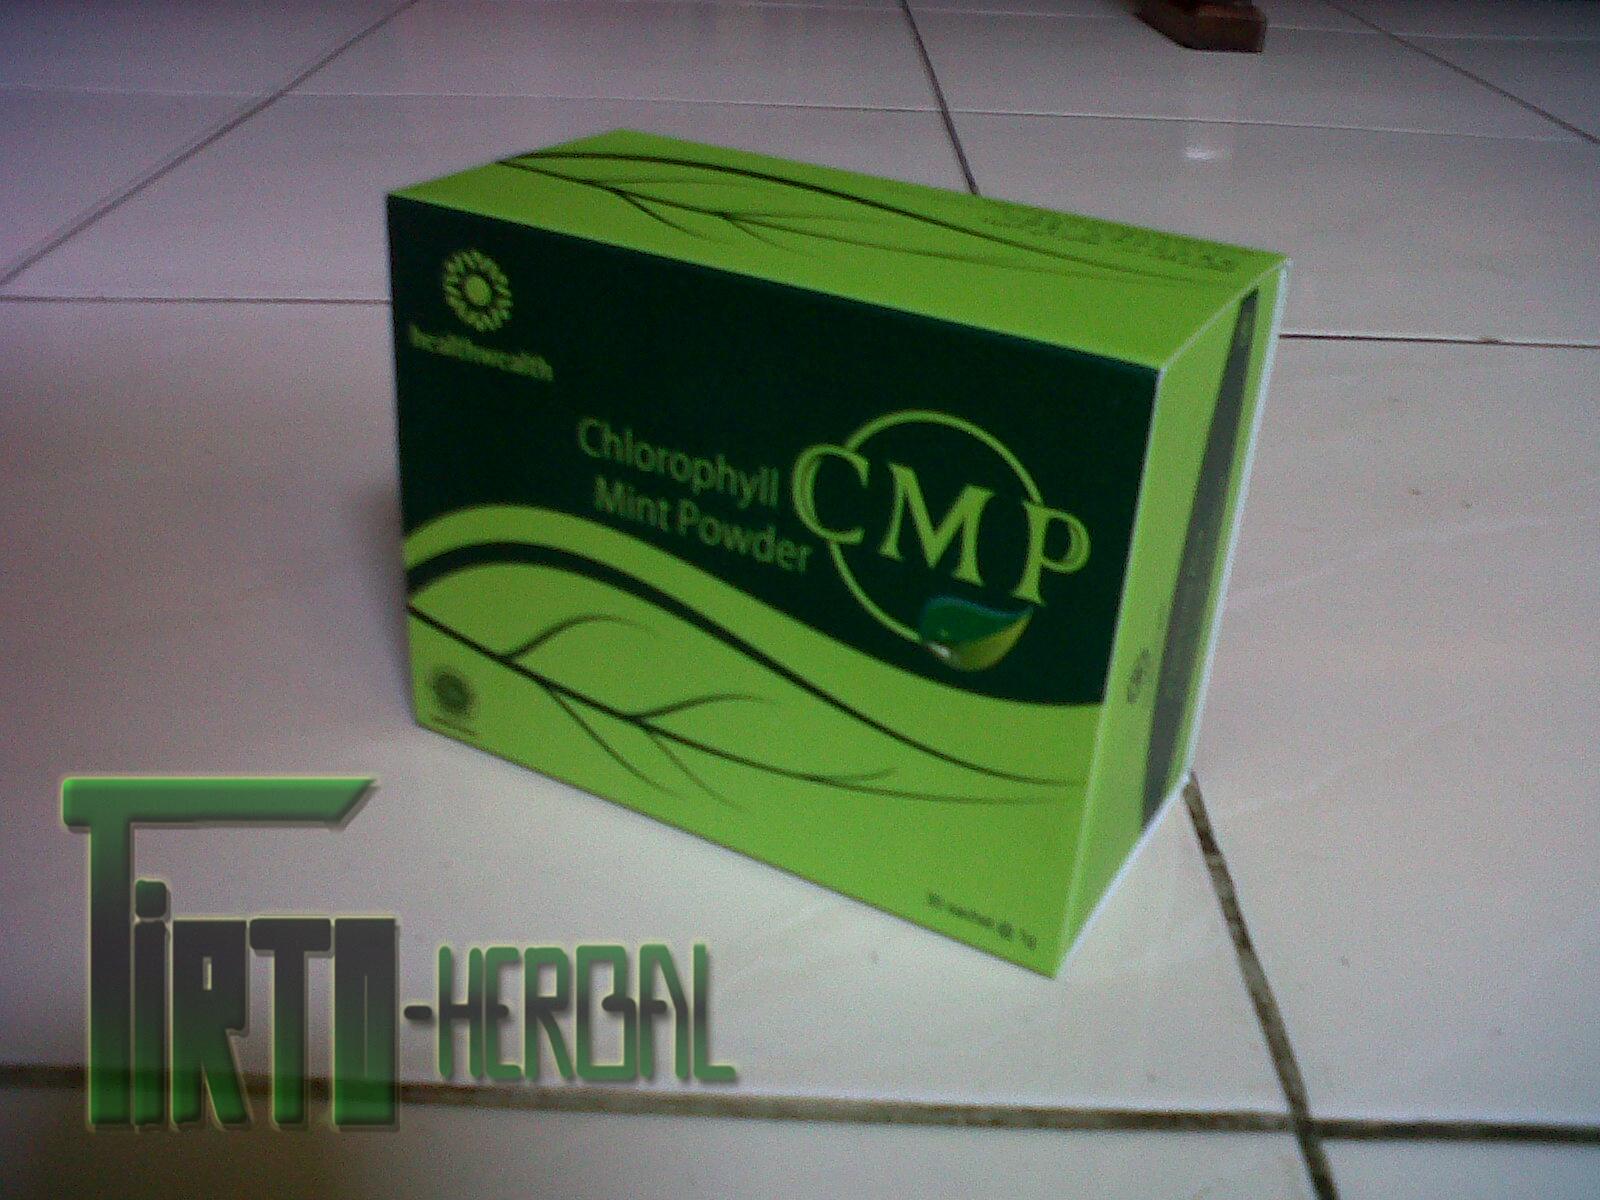 Kesaksian CMP (Chlorophyll Mint Powder)